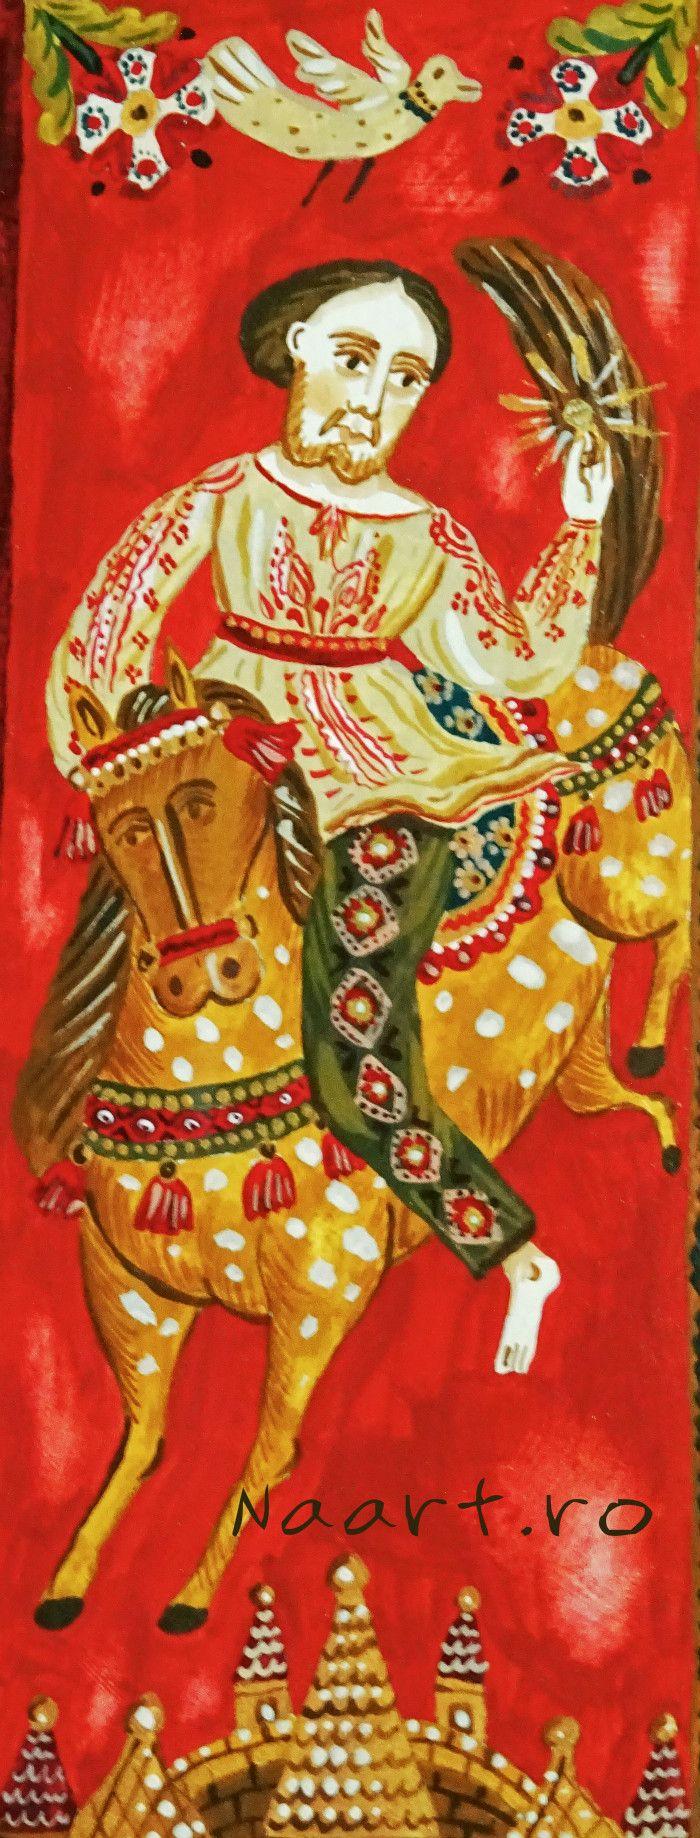 The brave one Detail of a painting by Naart.ro http://naart.ro/en/povestea-lui-cenusotca/